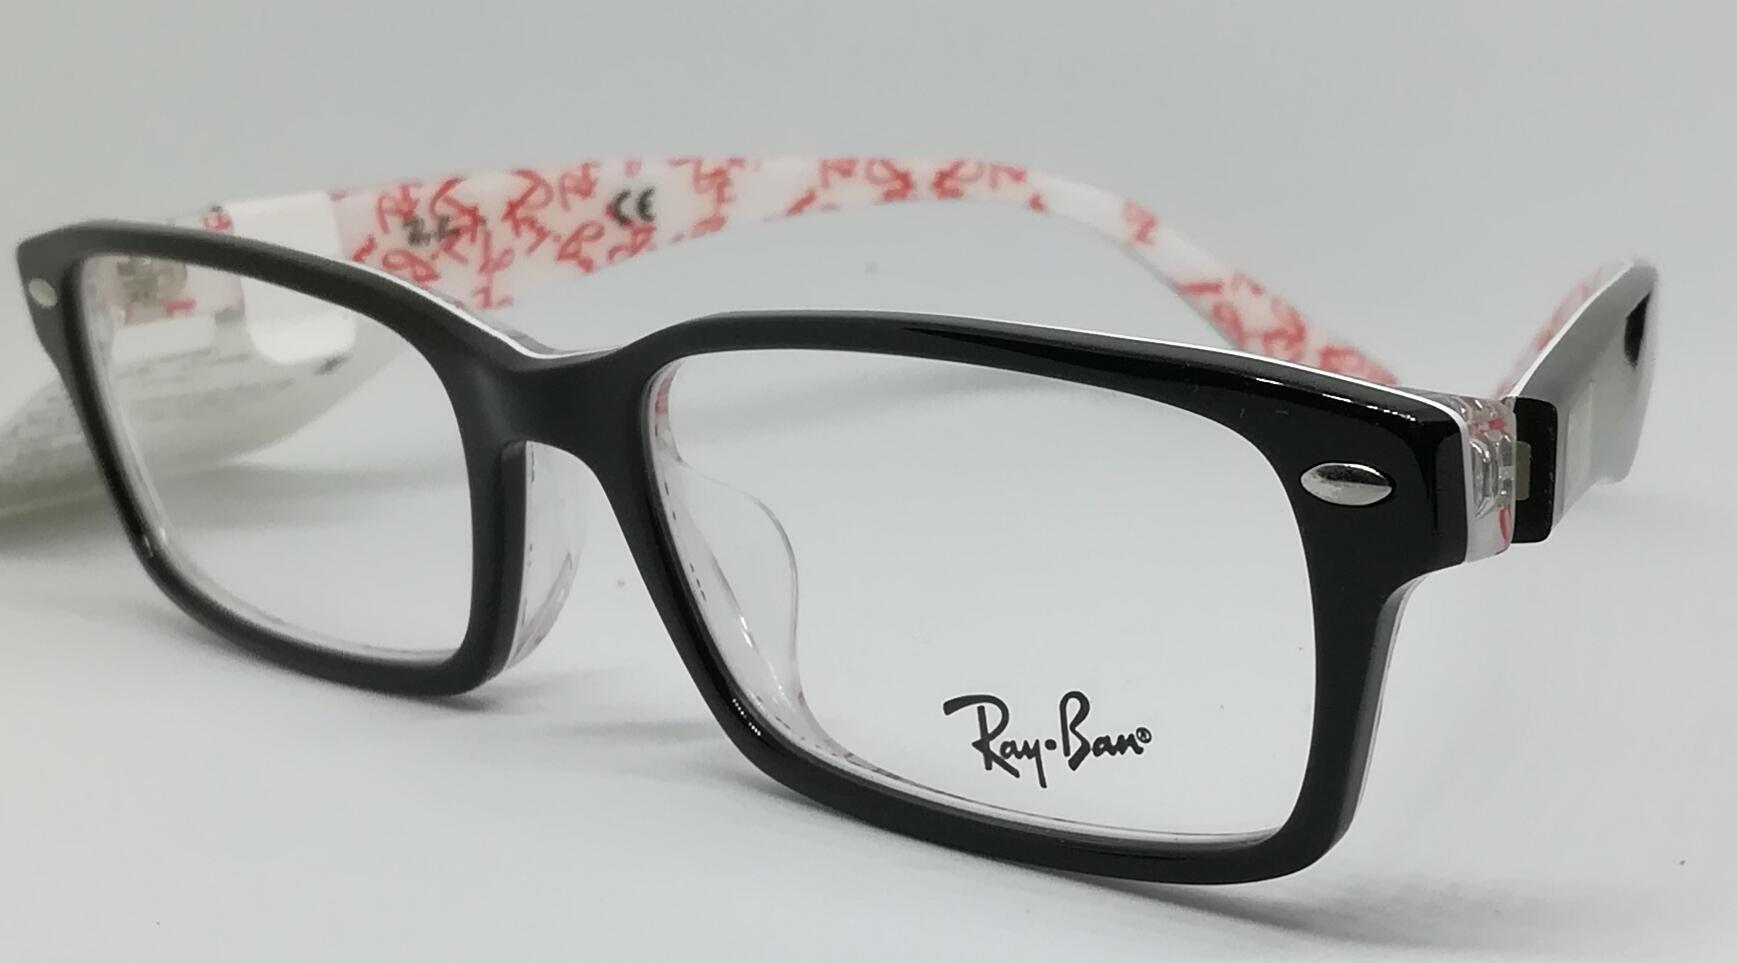 Rayban RX5206F 5014 54